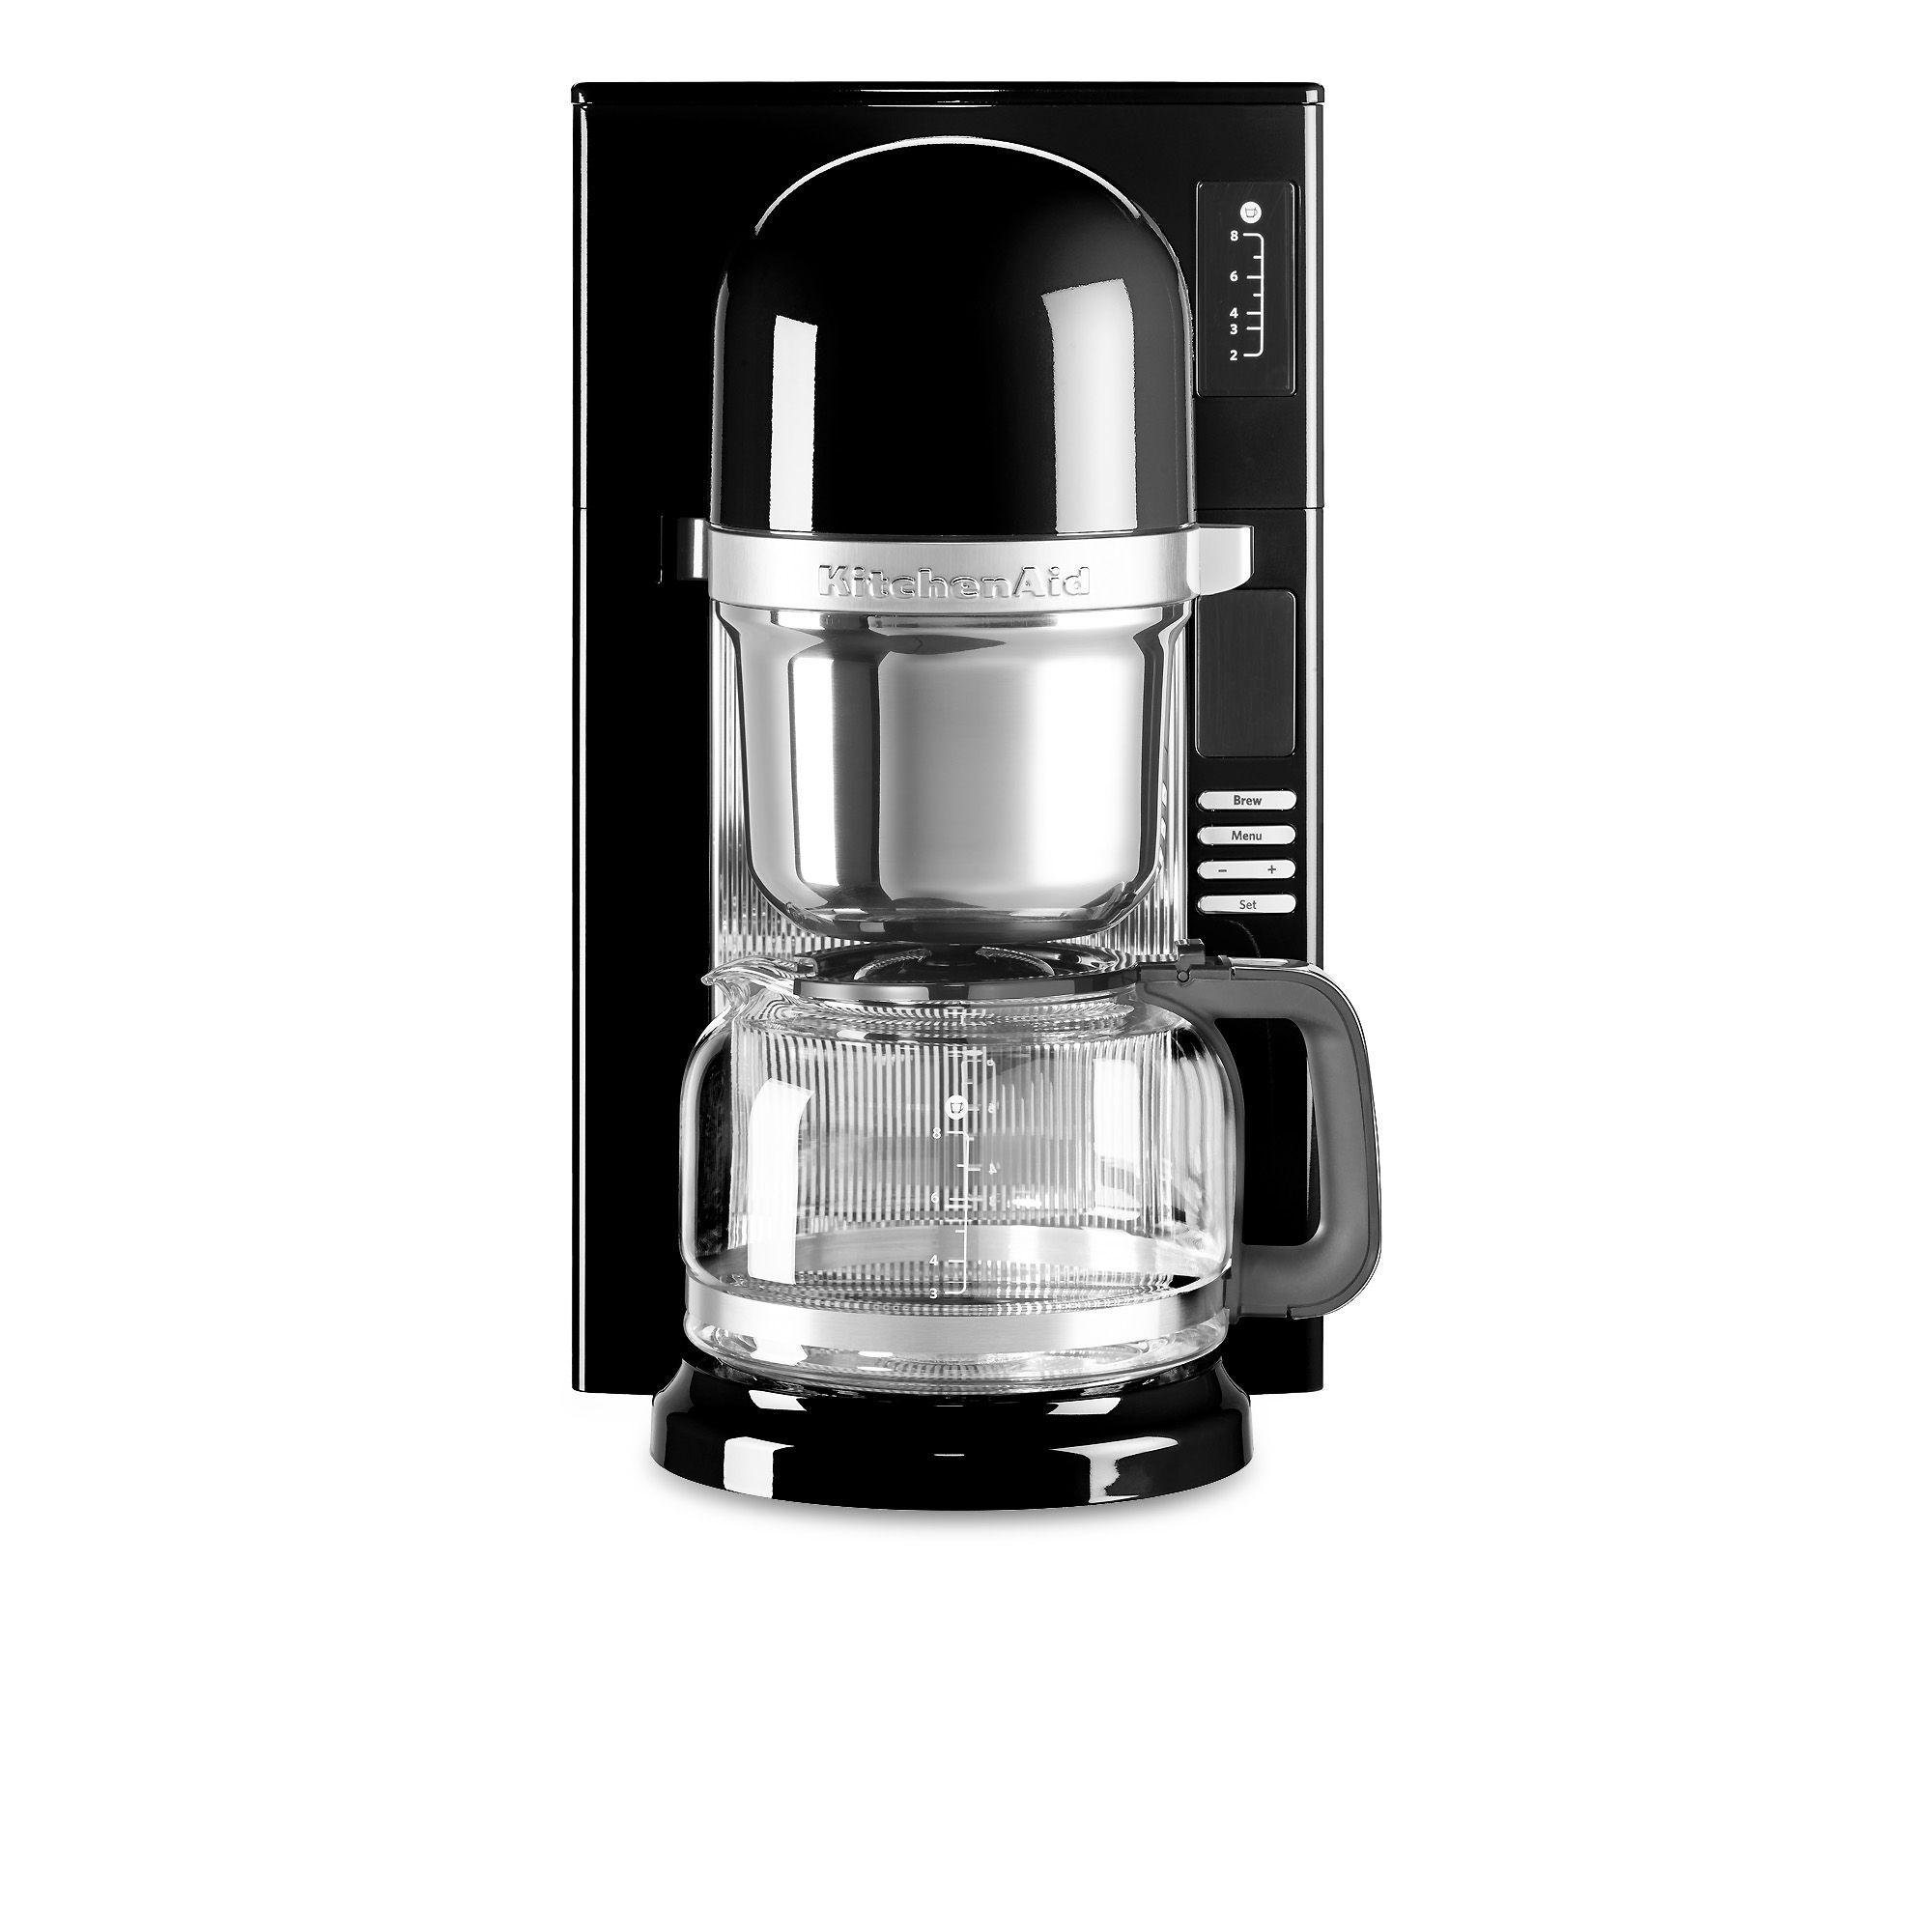 Kitchenaid macchina per caff americano kcm0802 qvc italia - Qvc marchi cucina ...